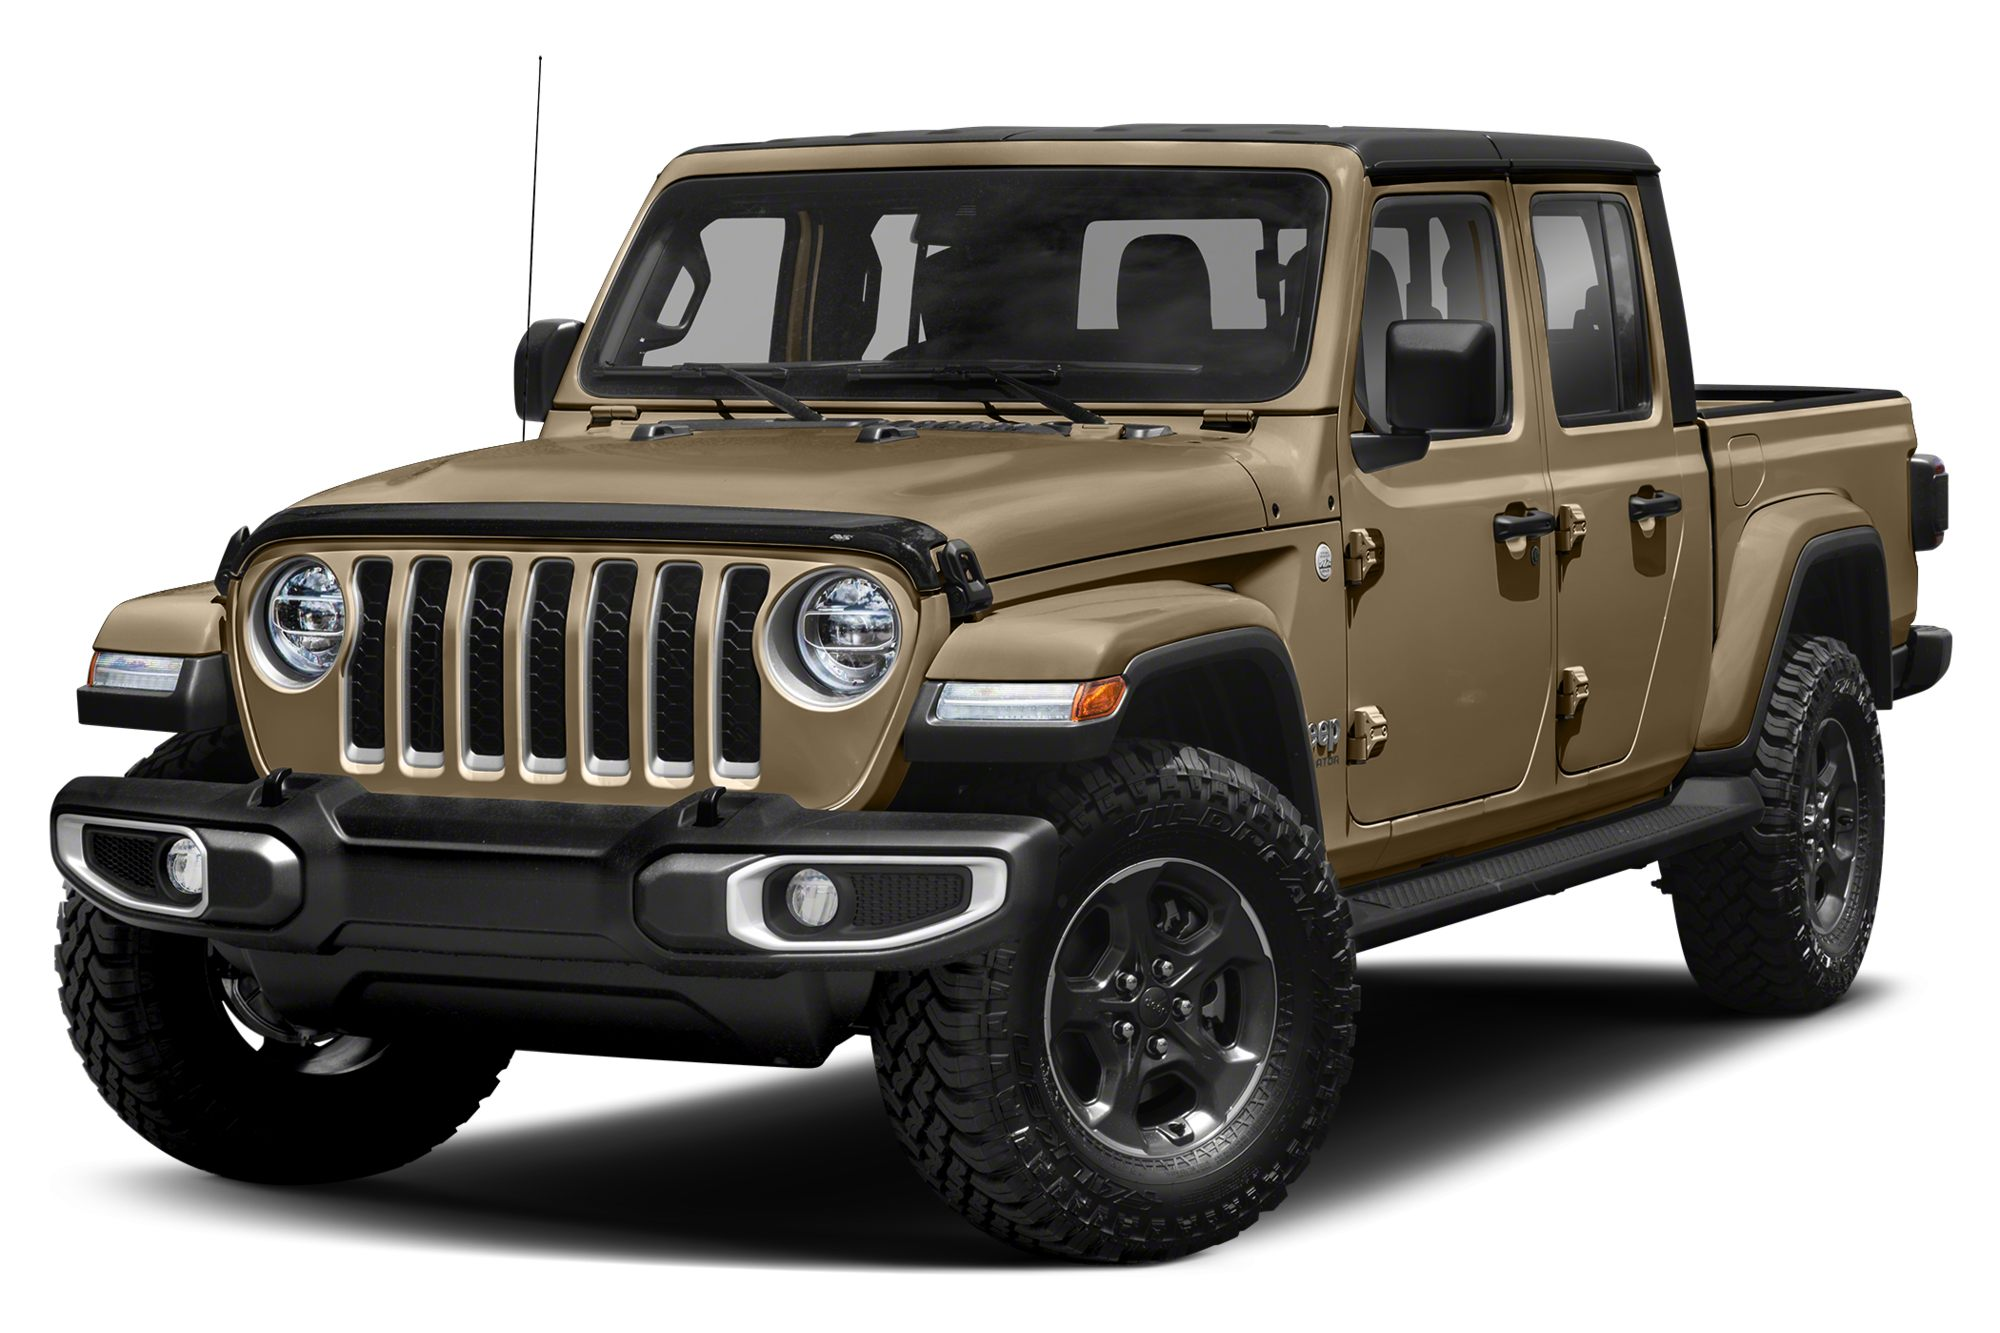 2020 Jeep Gladiator: Recall Alert